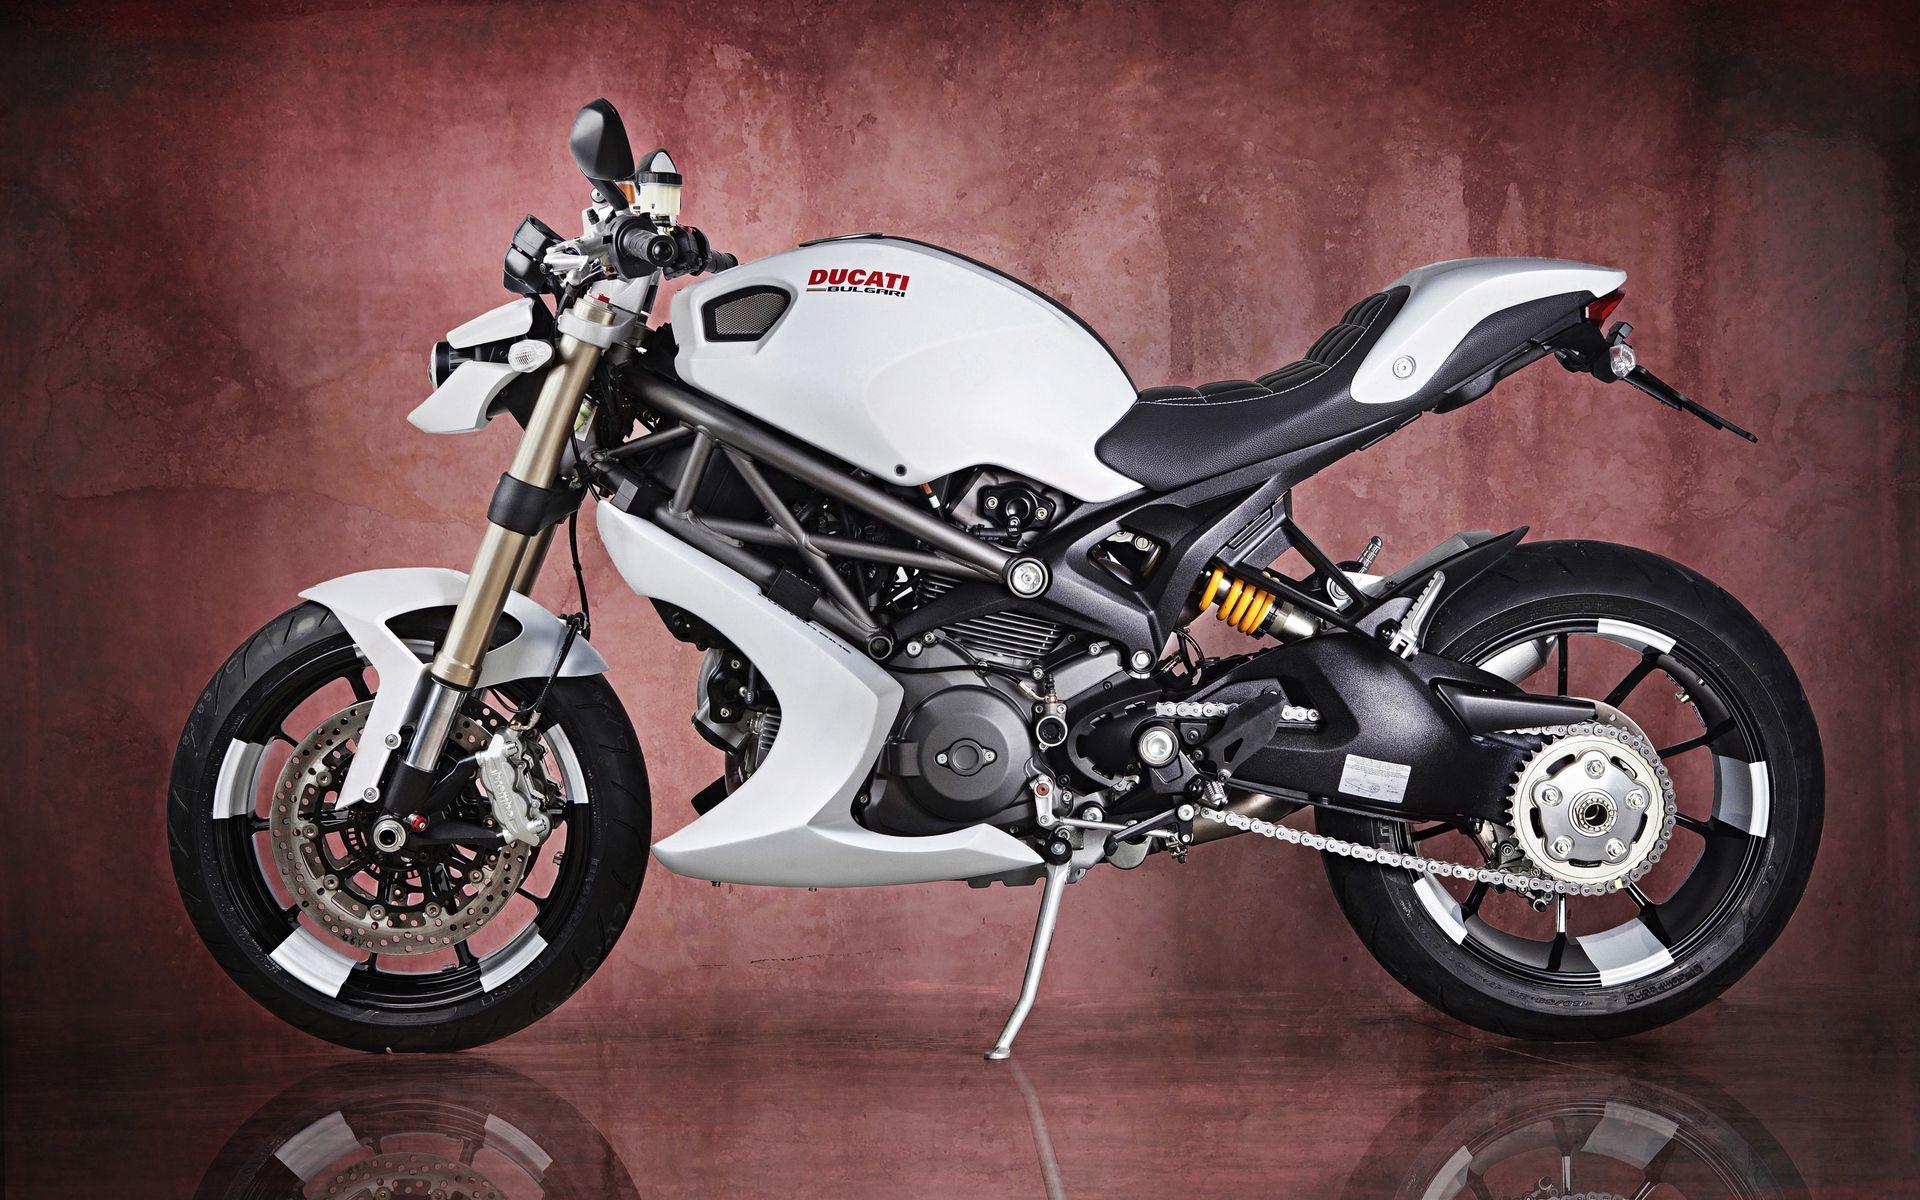 Ducati monster 1100 EVO HD wallpaper